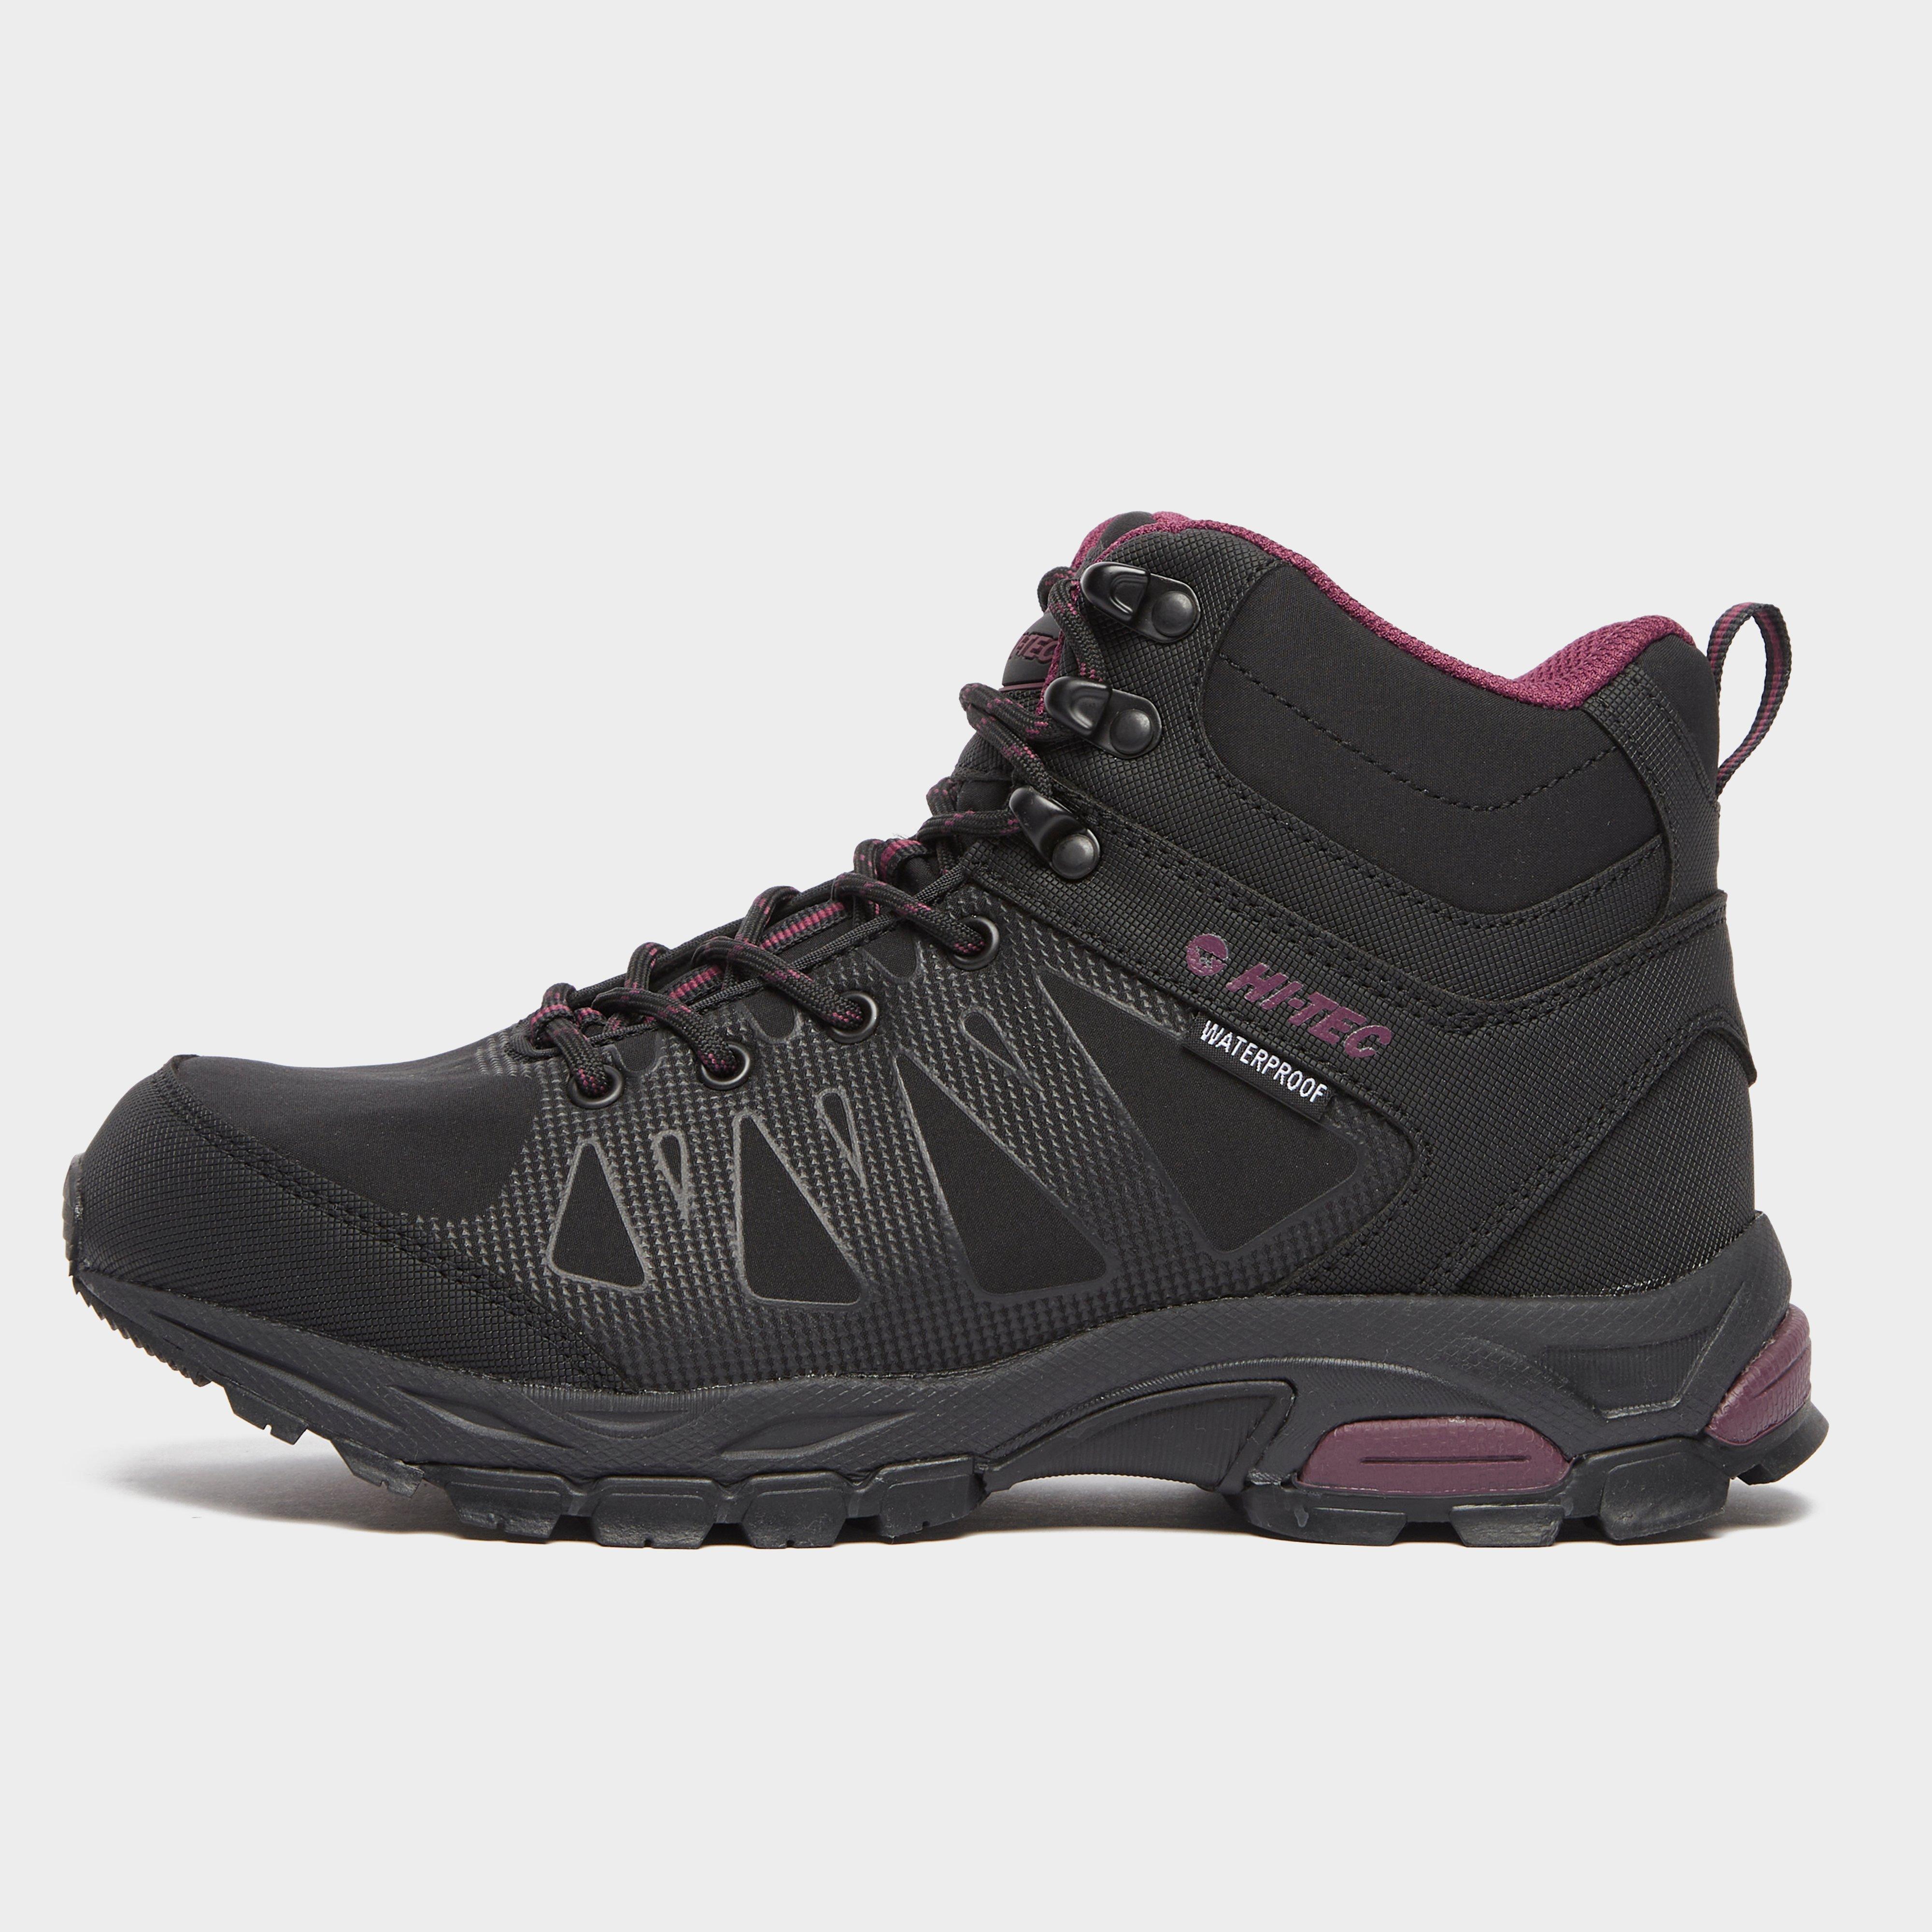 Hi Tec Women's Raven Mid Waterproof Hiking Boot - Black, Black